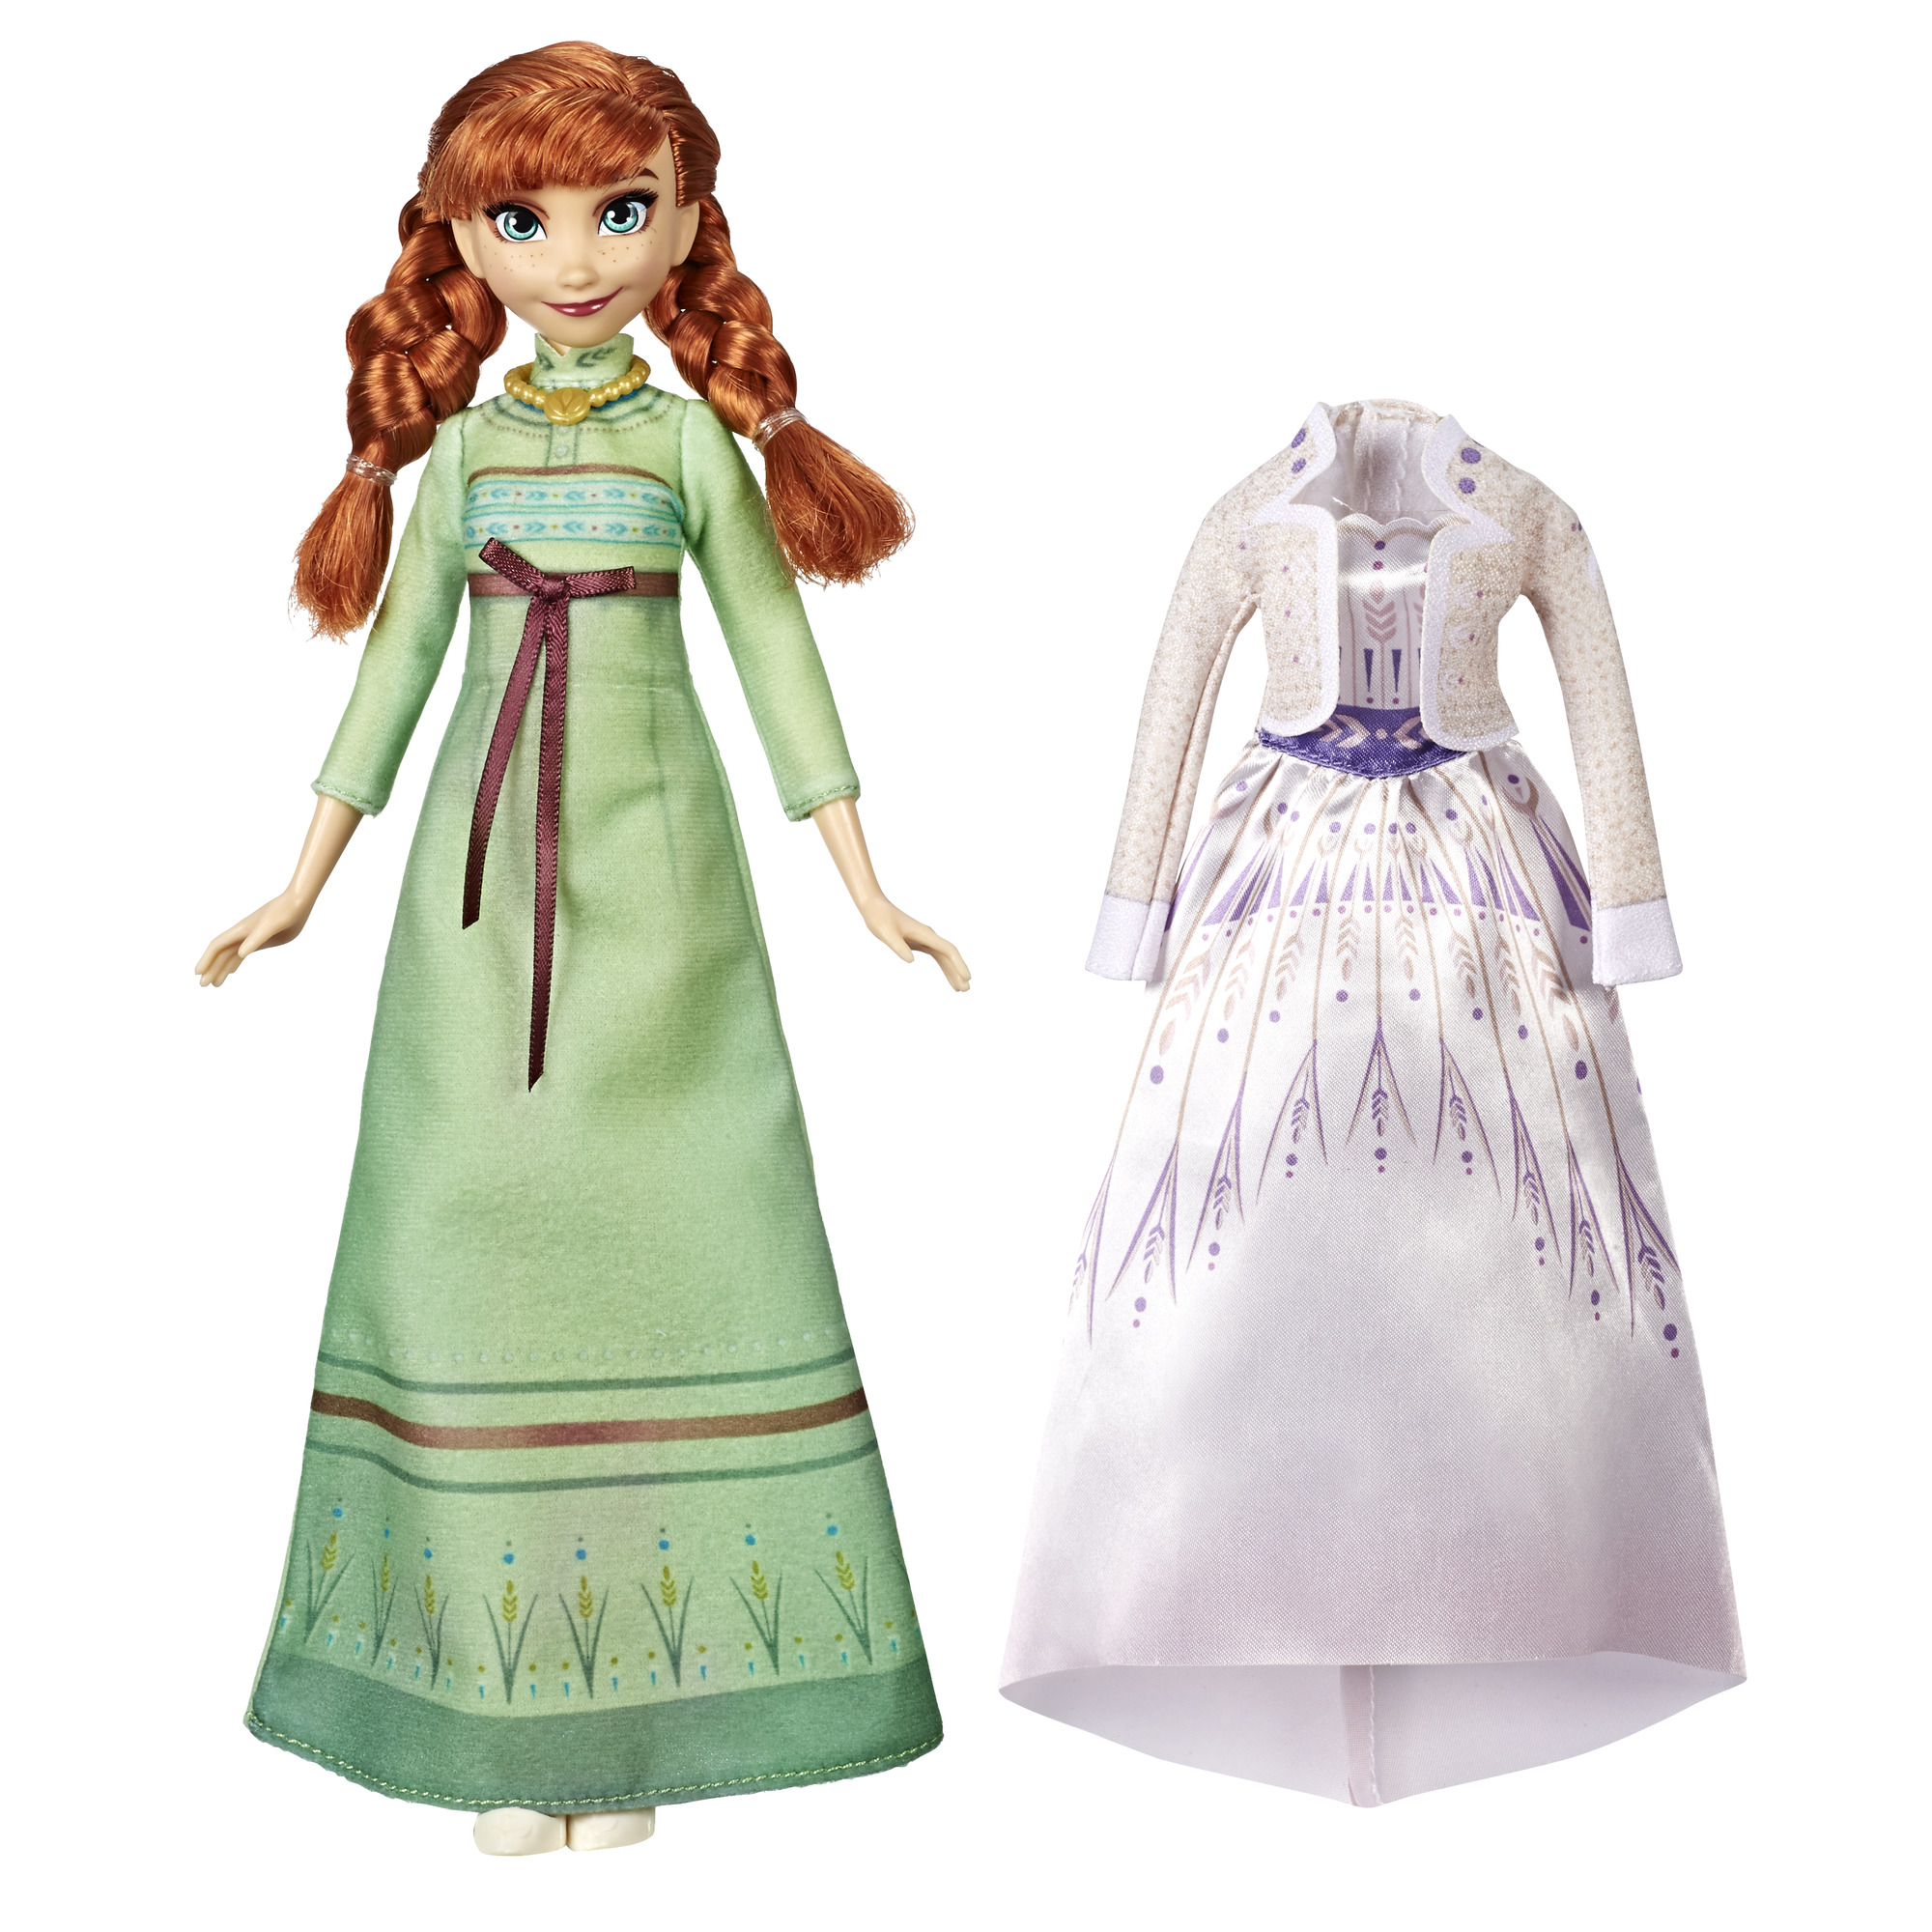 insieme esilio Sedativo  Disney Frozen 2 Arendelle Anna Doll with Dress, Nightgown & Shoes -  Walmart.com - Walmart.com